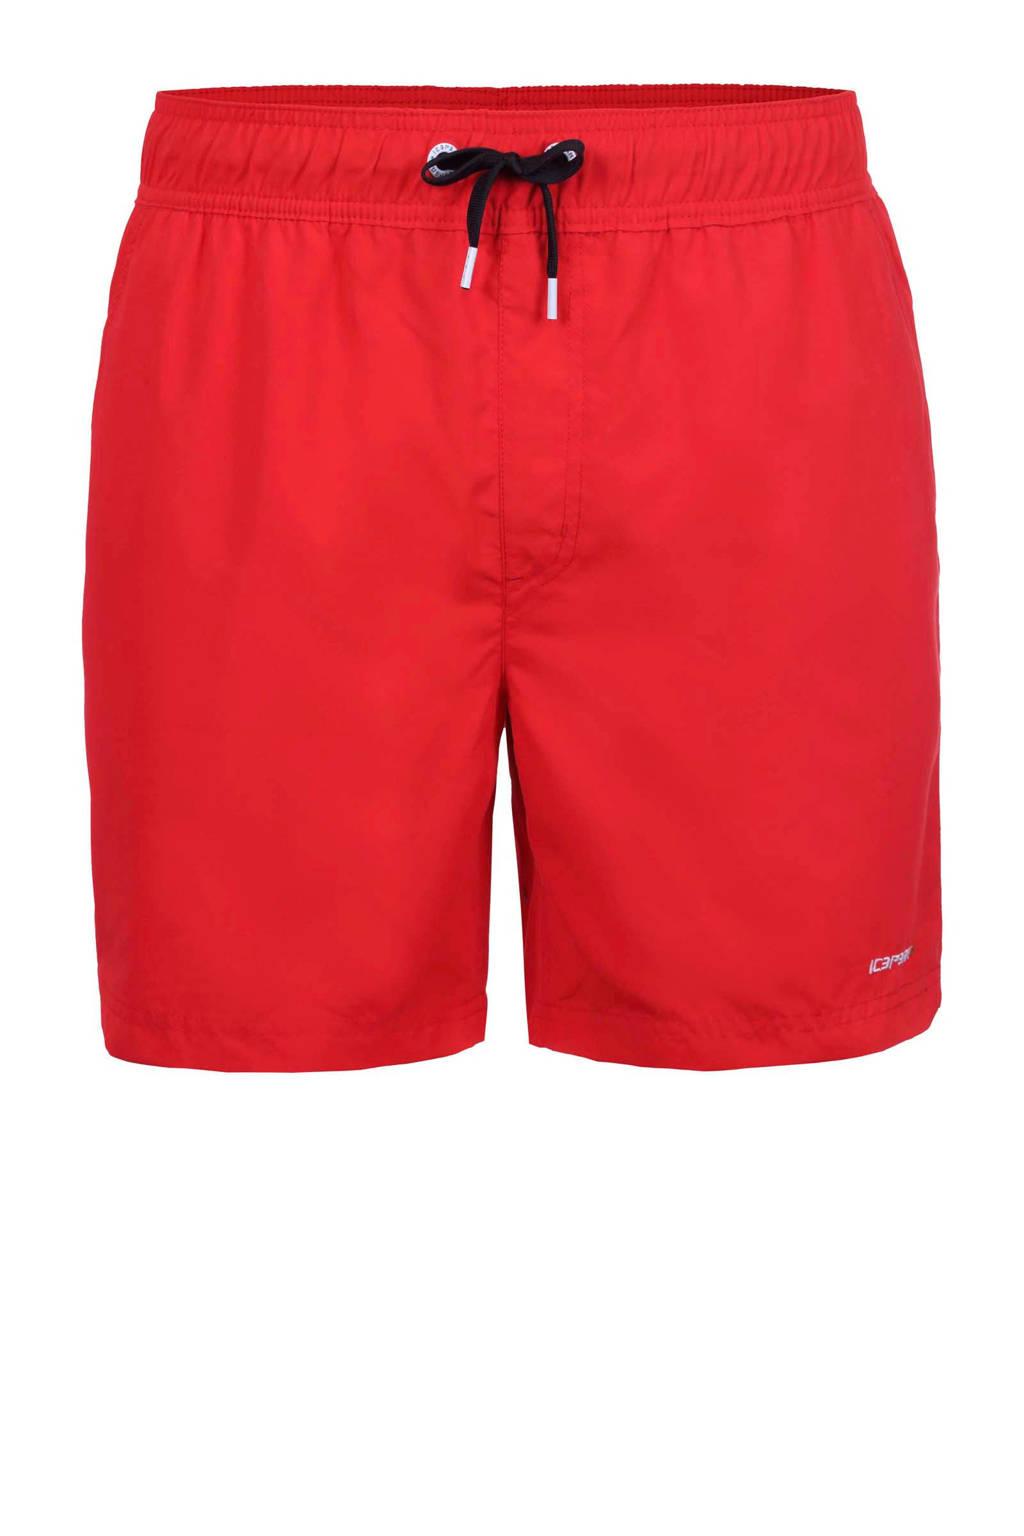 Icepeak Kade outdoor zwemshort rood, Classic Red